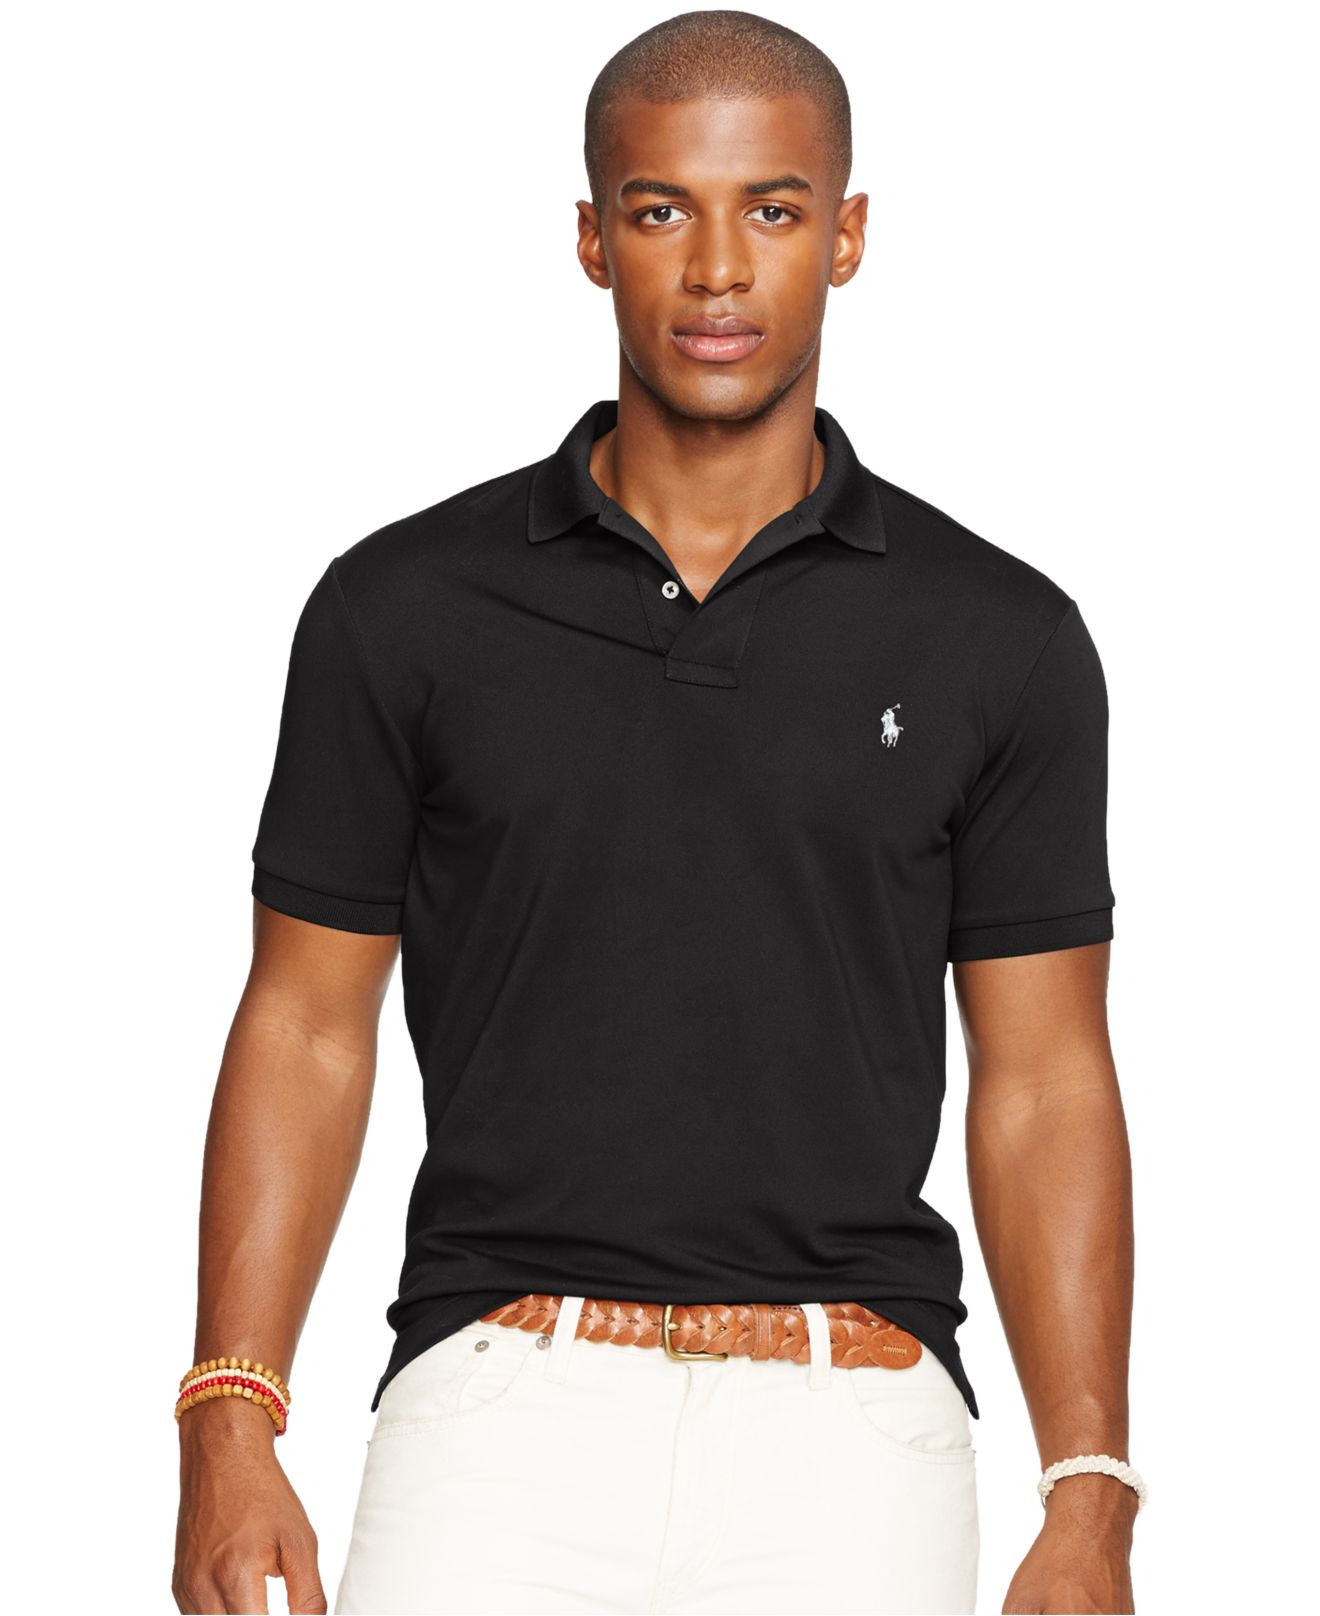 polo ralph lauren performance mesh polo shirt in black for men lyst. Black Bedroom Furniture Sets. Home Design Ideas